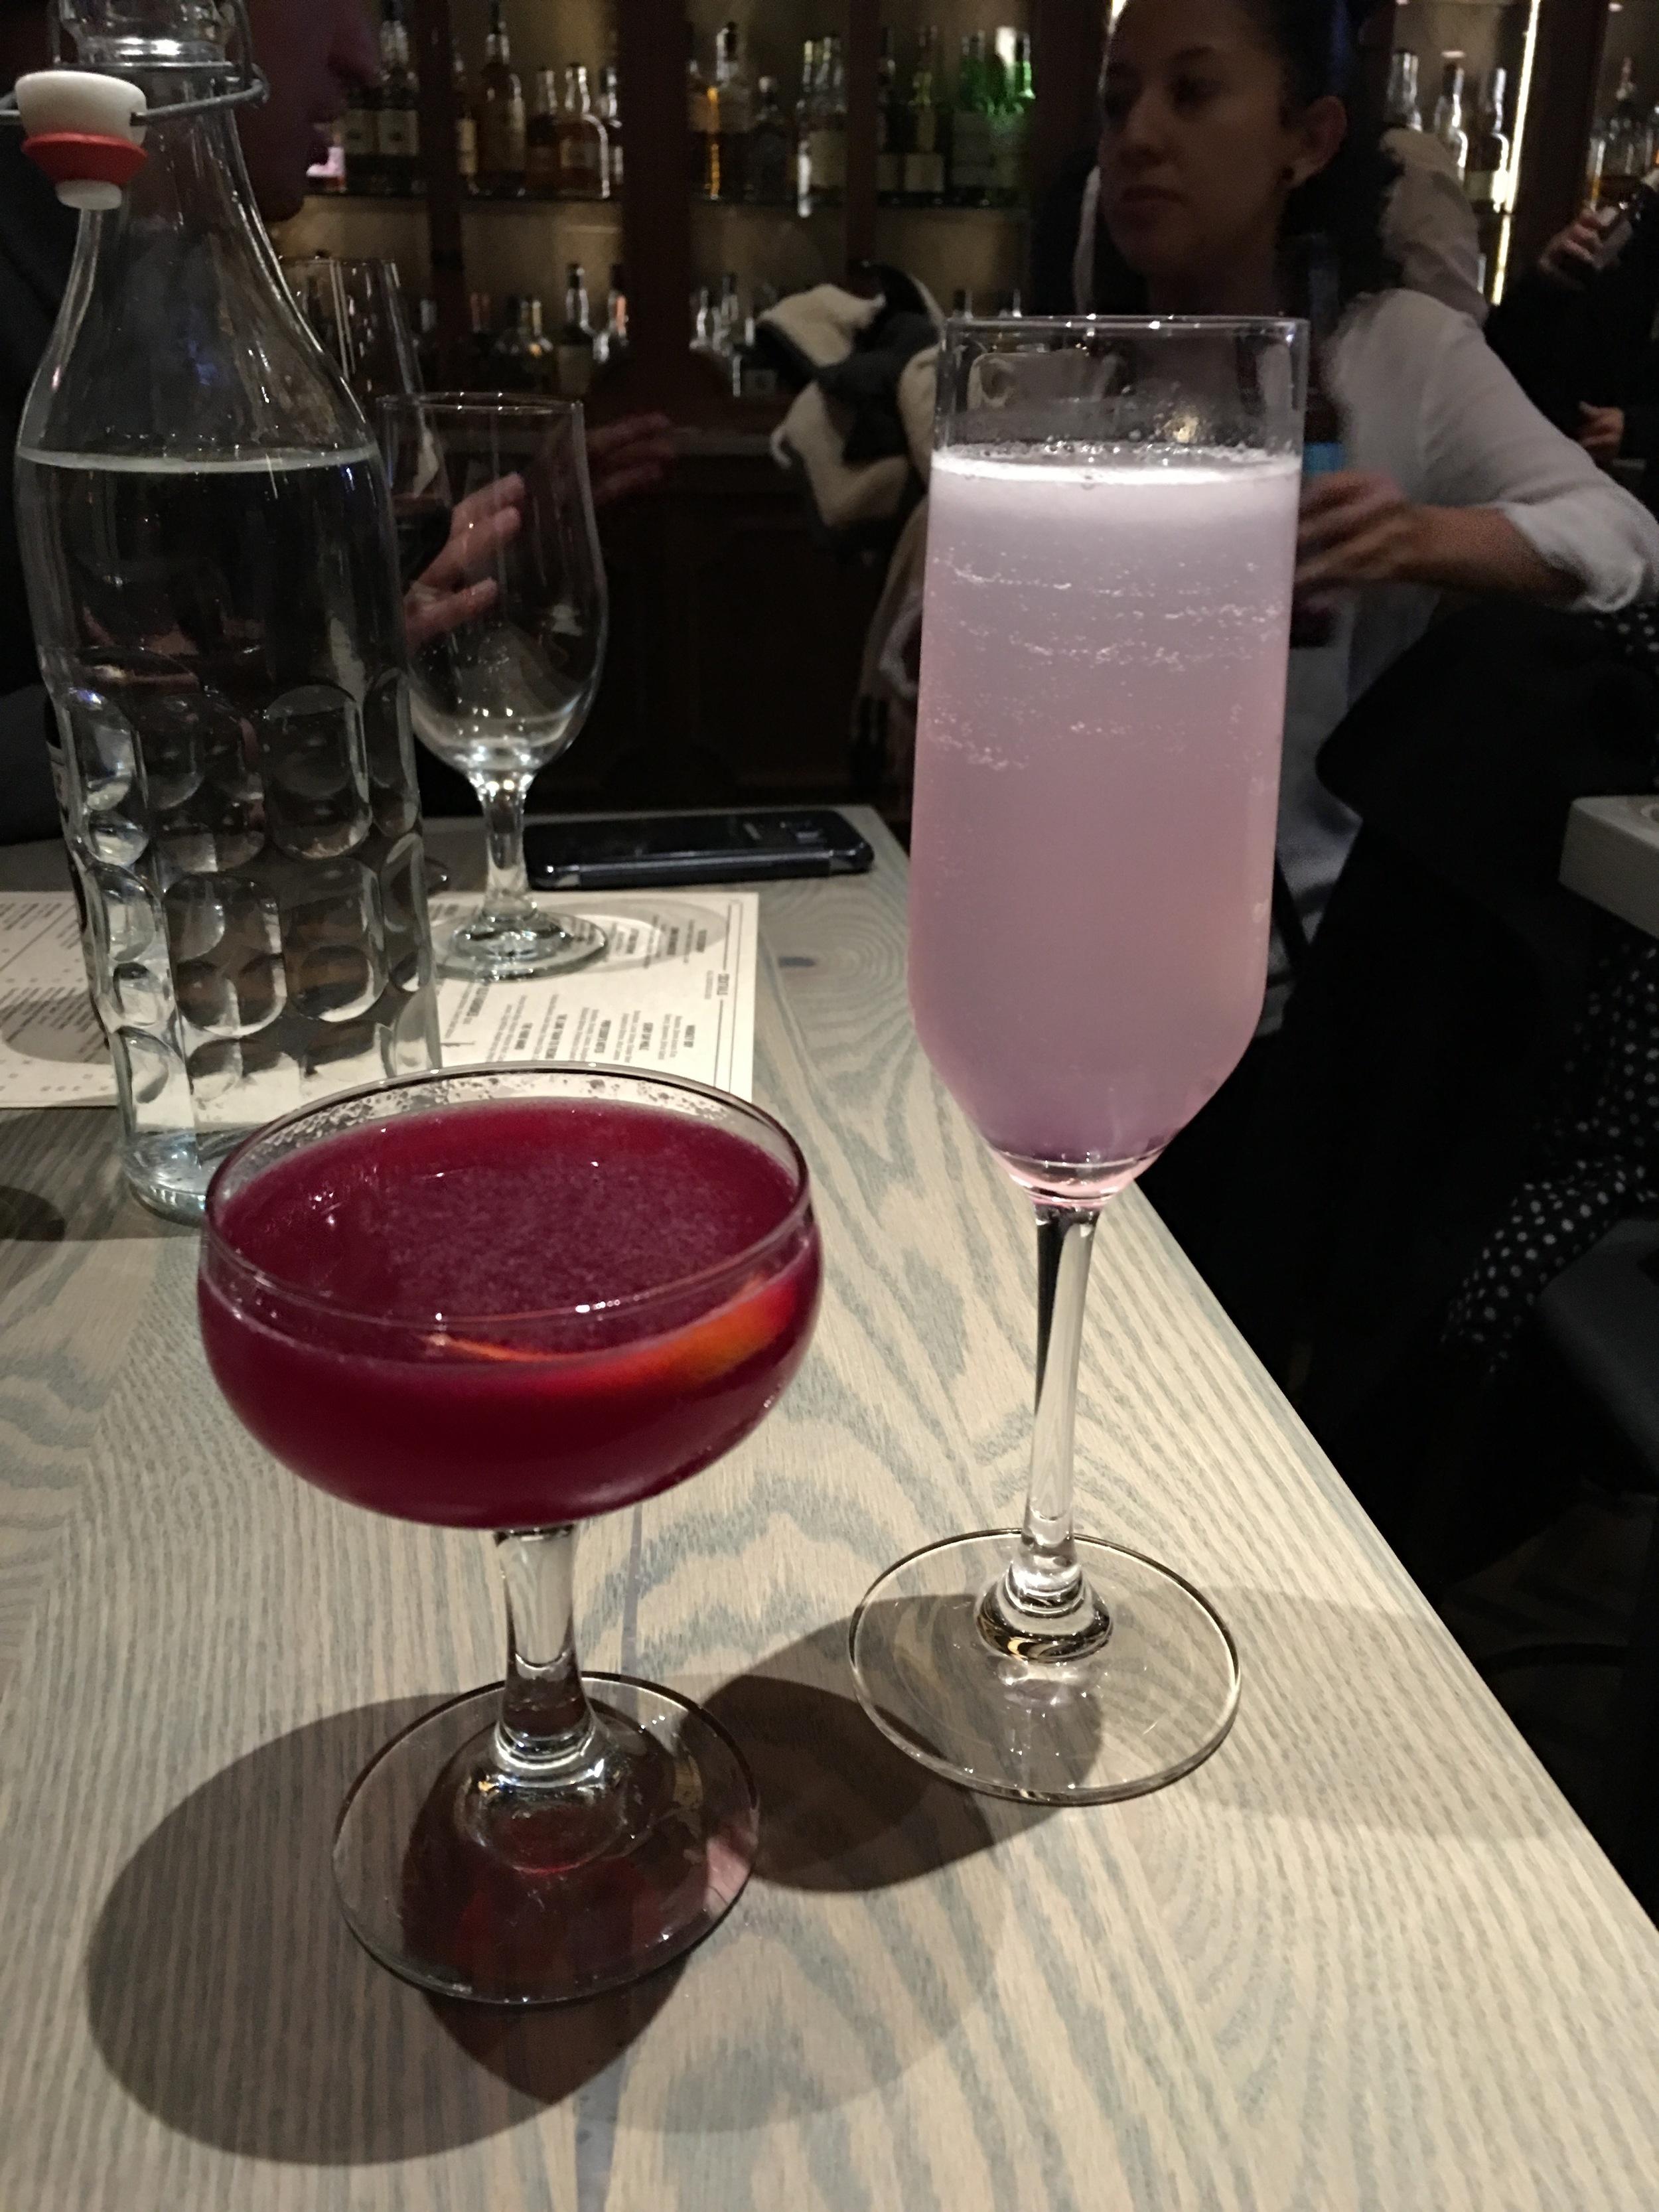 Madame Chareau - Vodka, Sparkling Rose, Chareau, Pample Mousse Liqueur, Lime (Derecha) Jitterbug Perfume - Gin, Beet Shrub, Luxardo Triplum, Framboise, Lime (Izquierda)